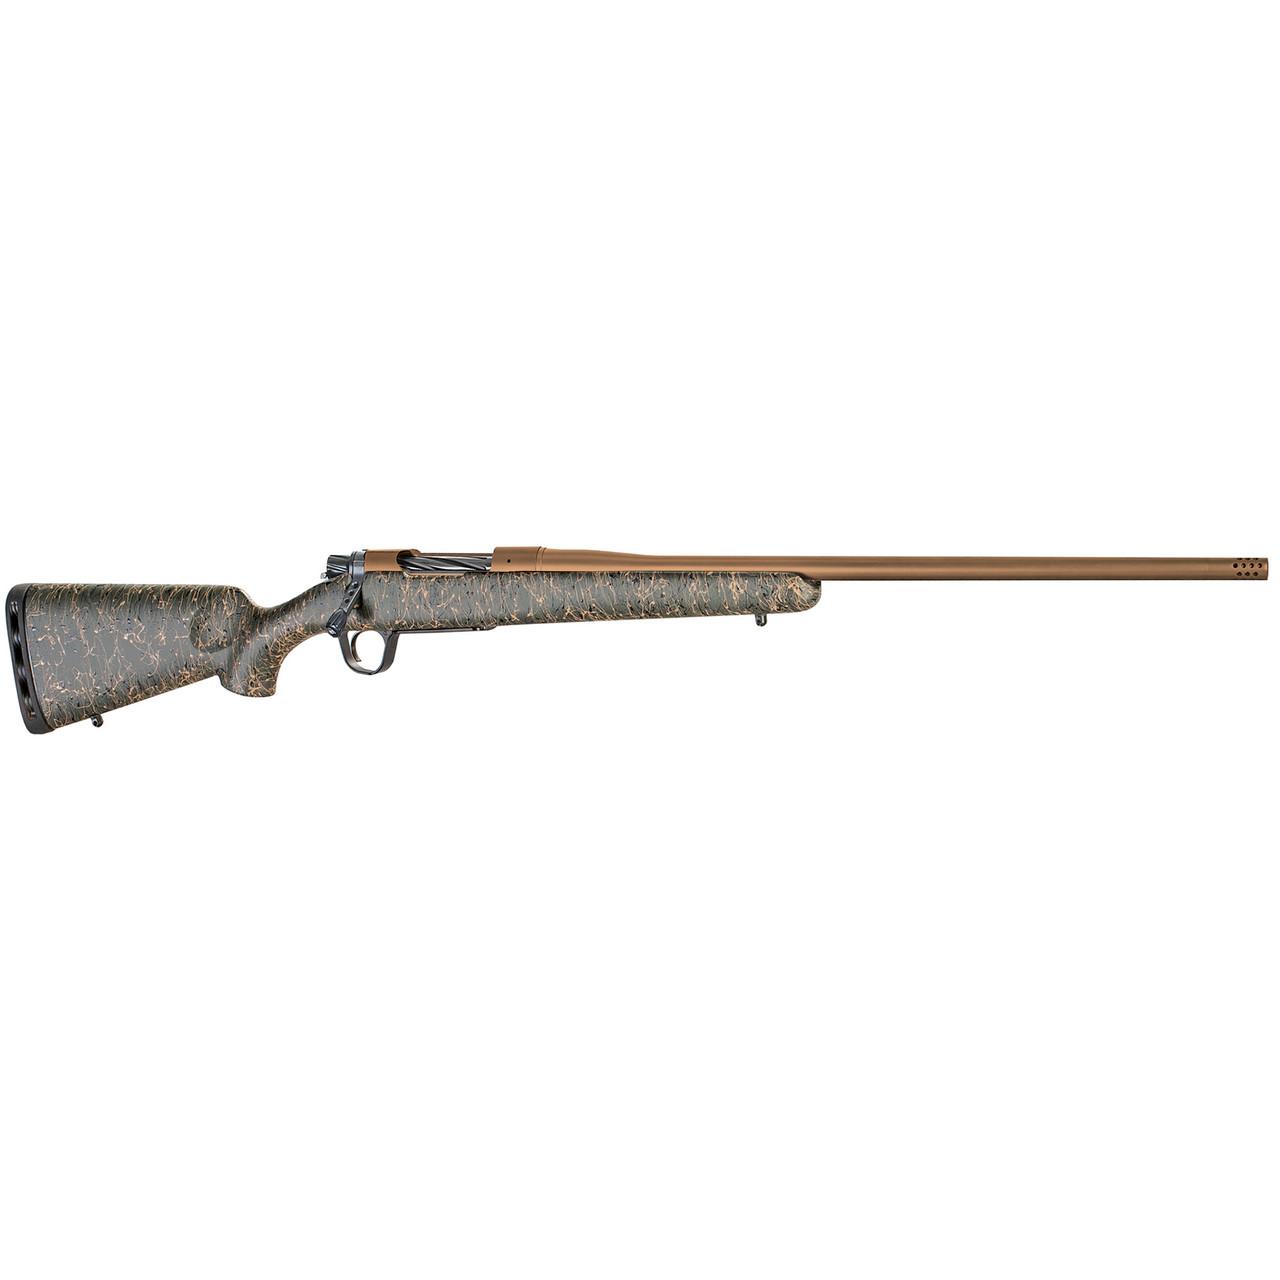 Christensen Arms Mesa CALIFORNIA LEGAL - .308/7.62x51 - Green w/ Black & Tan Webbing